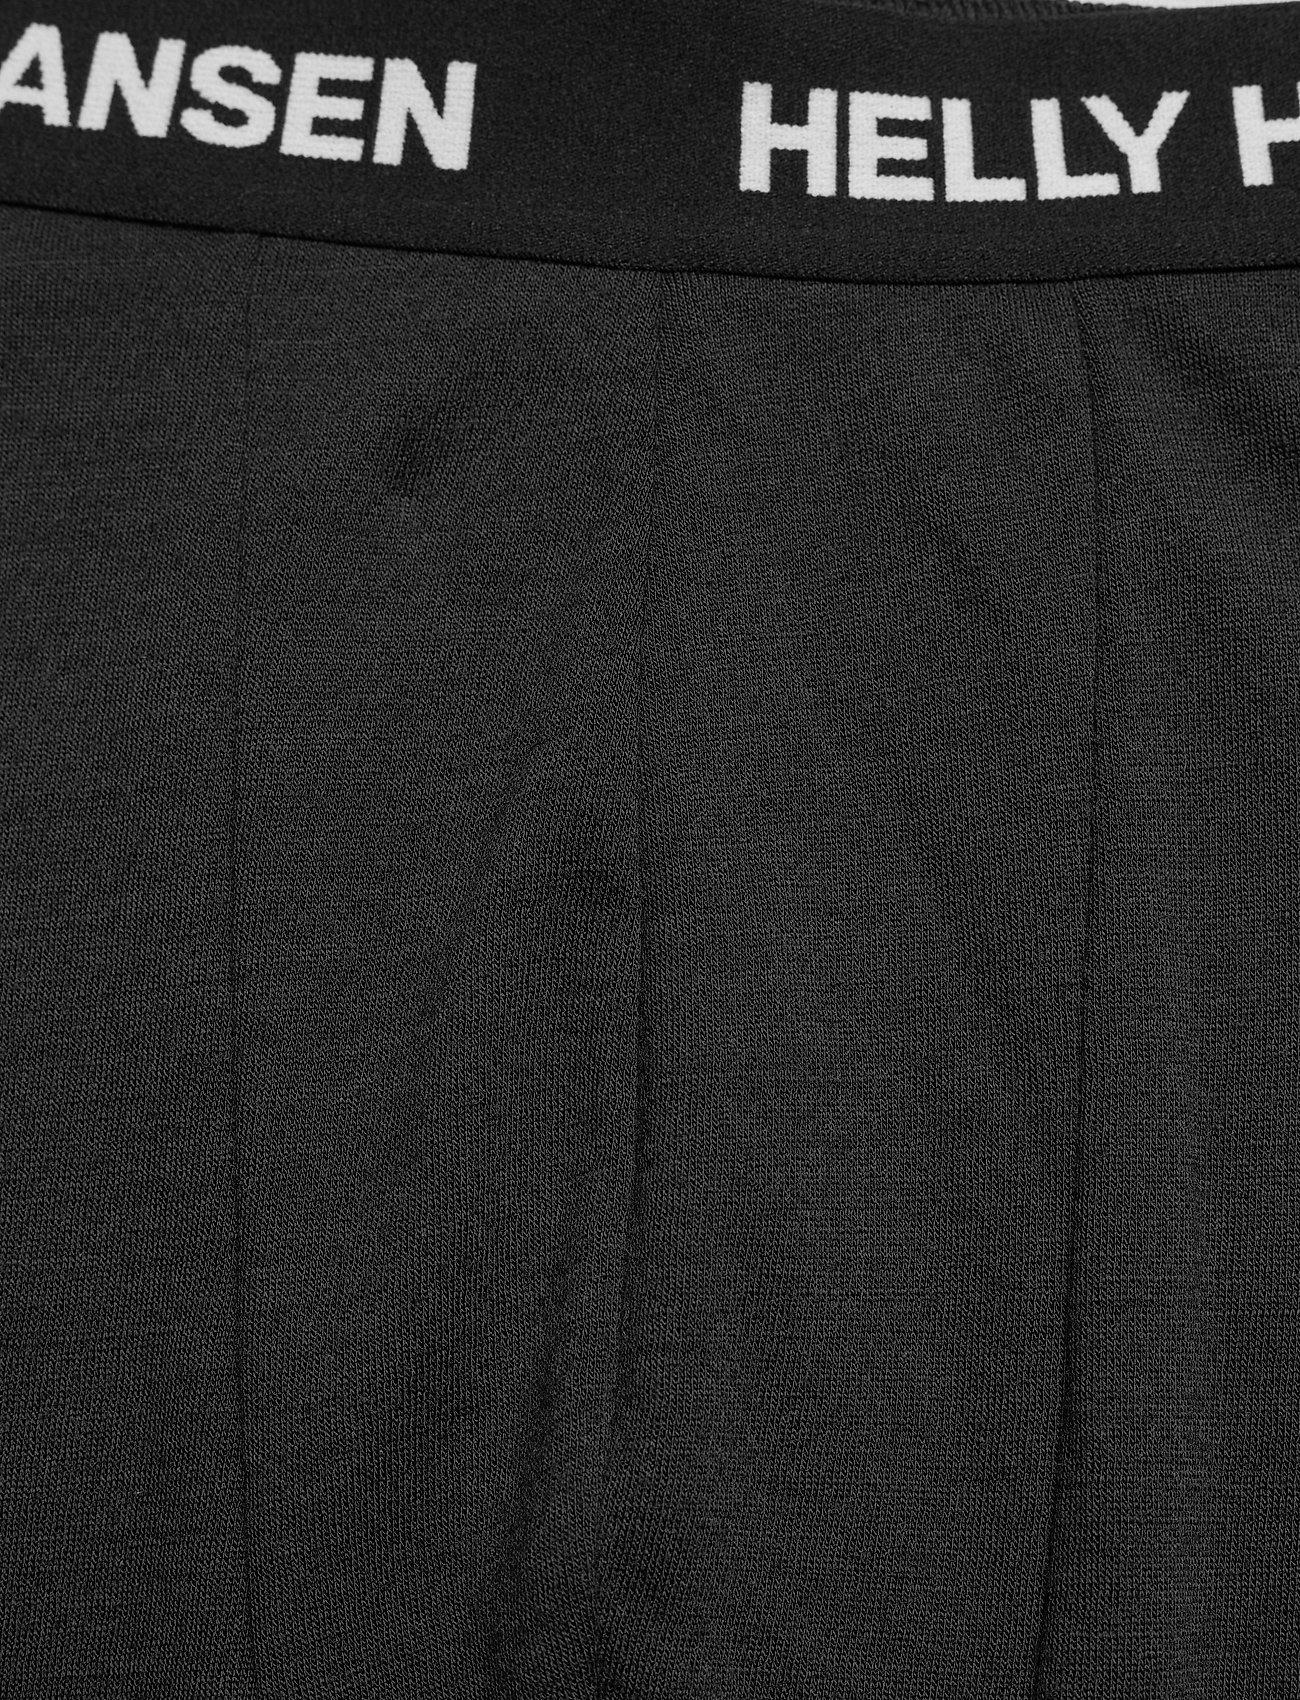 Lifa Merino Midweight Pant (Black) (60 €) - Helly Hansen kLdqZ